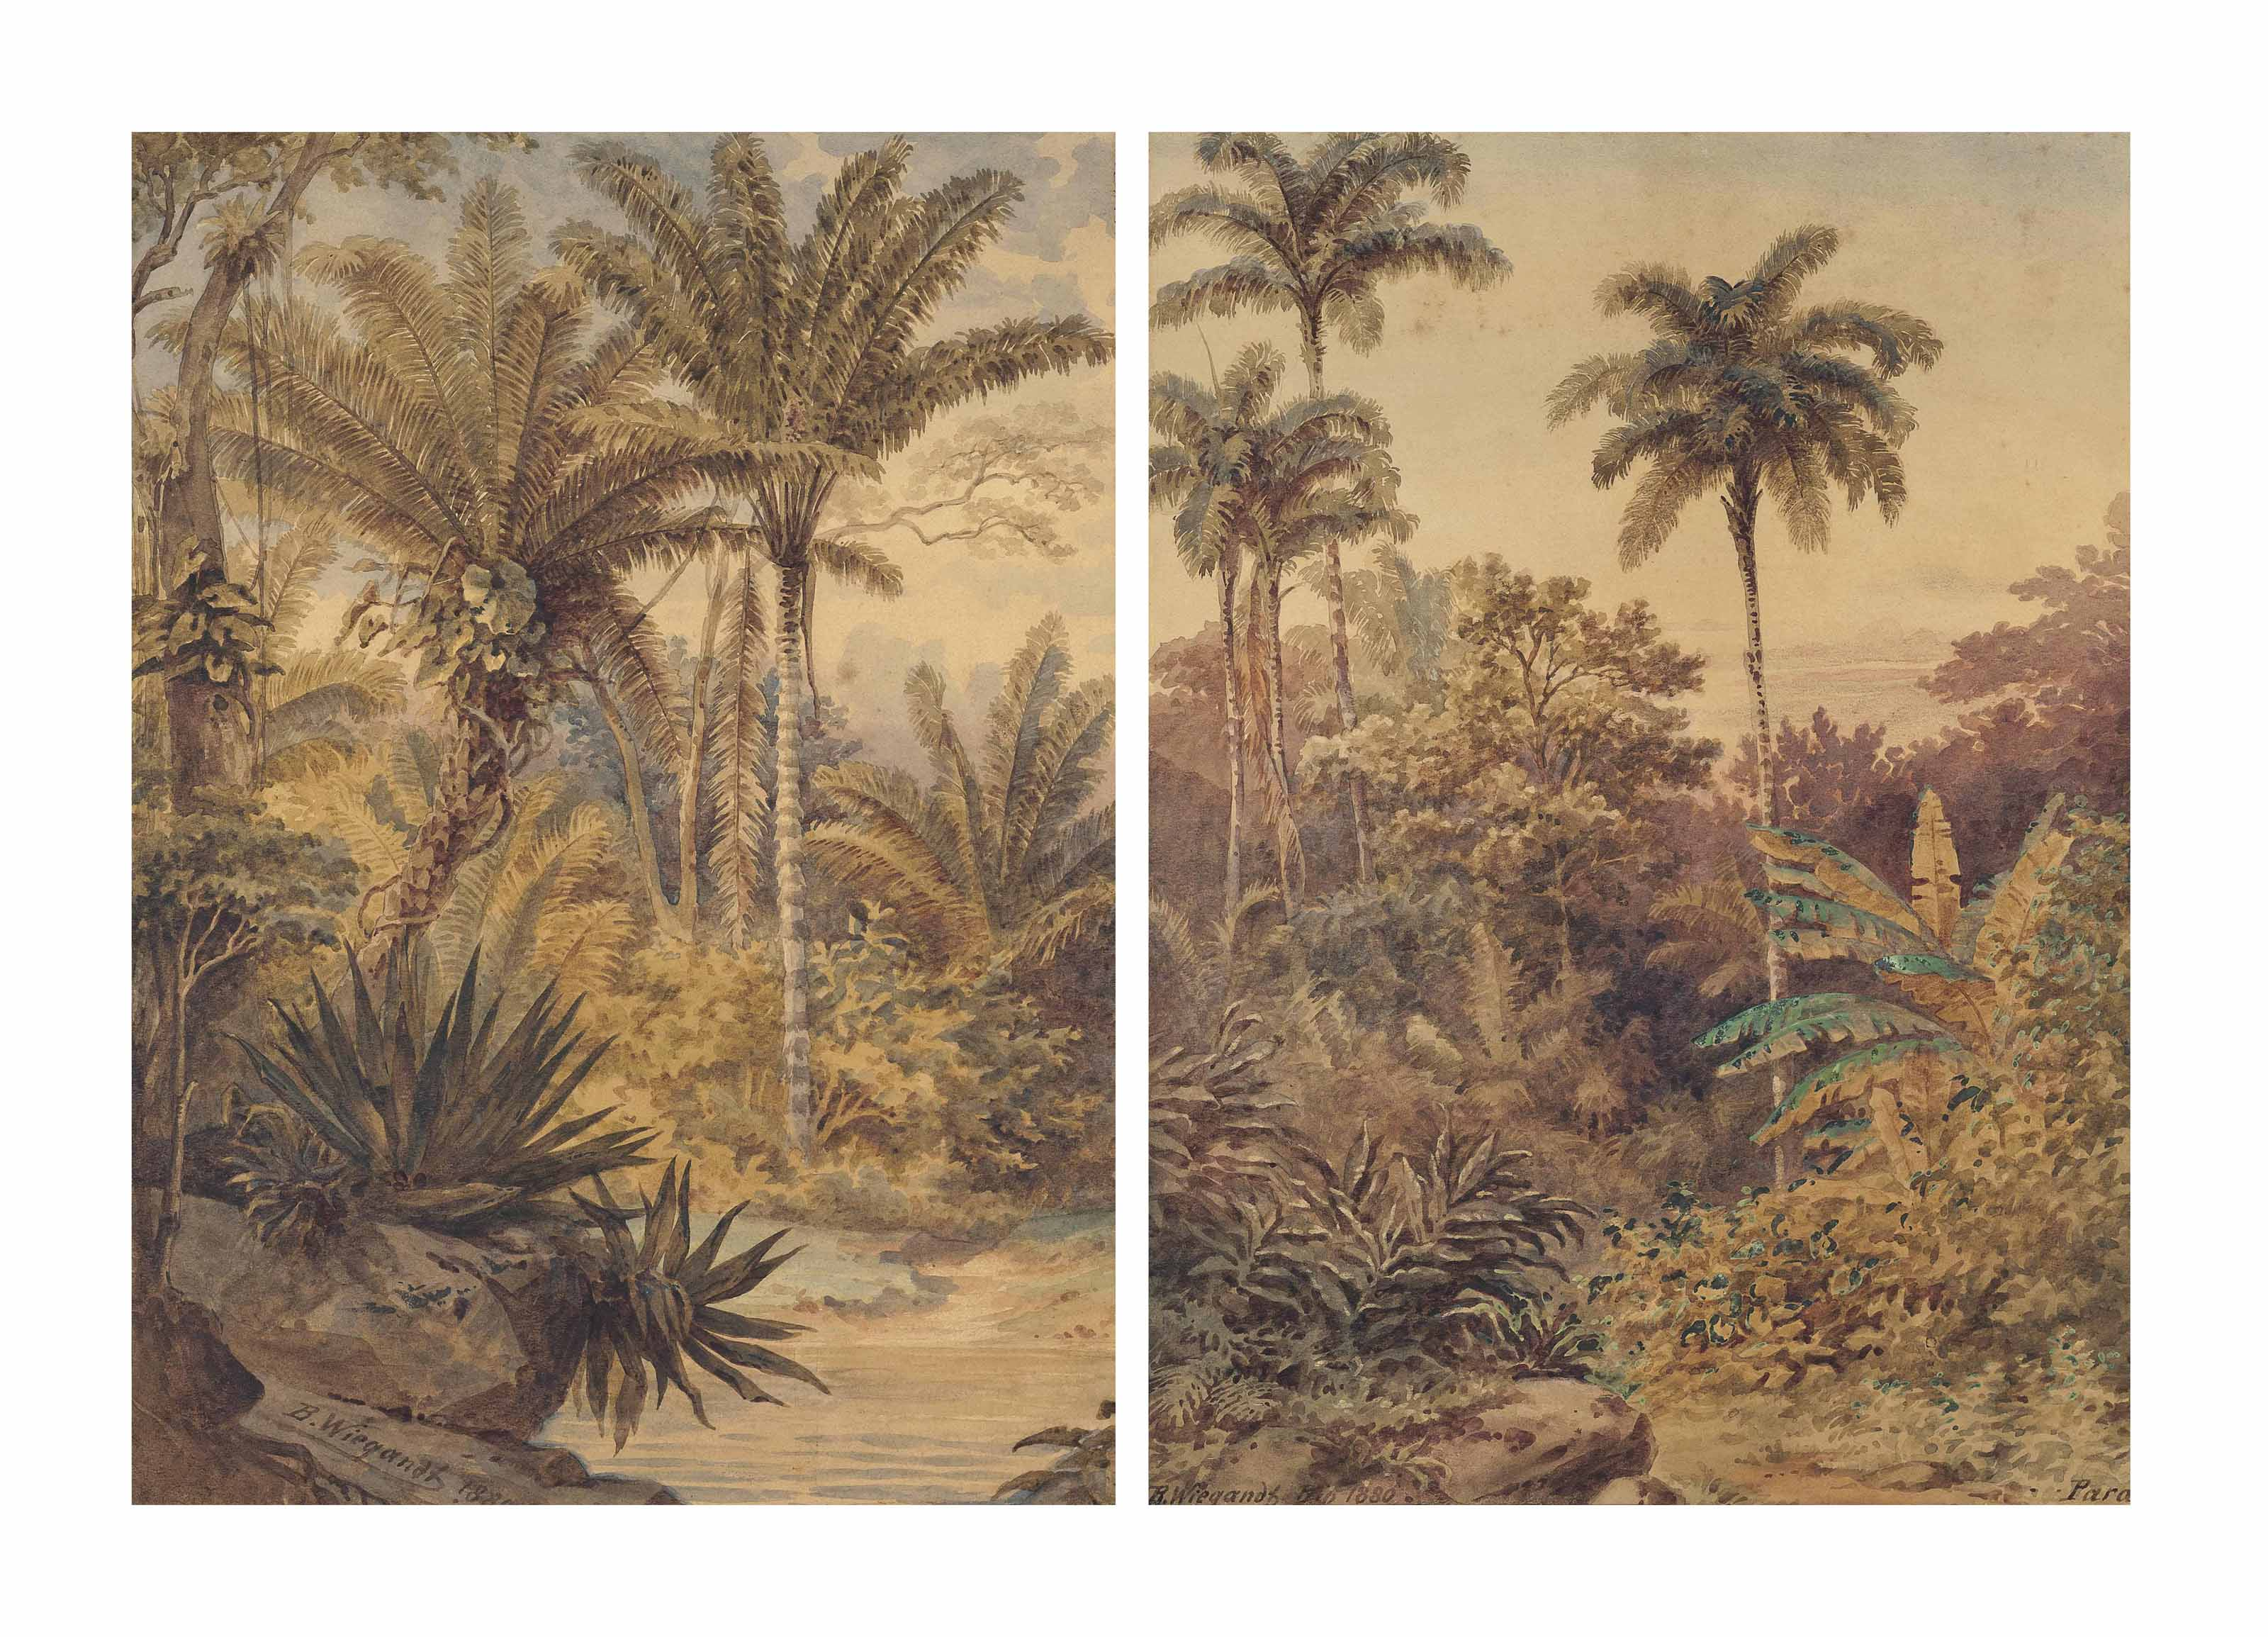 Brazillian rainforests, Pará